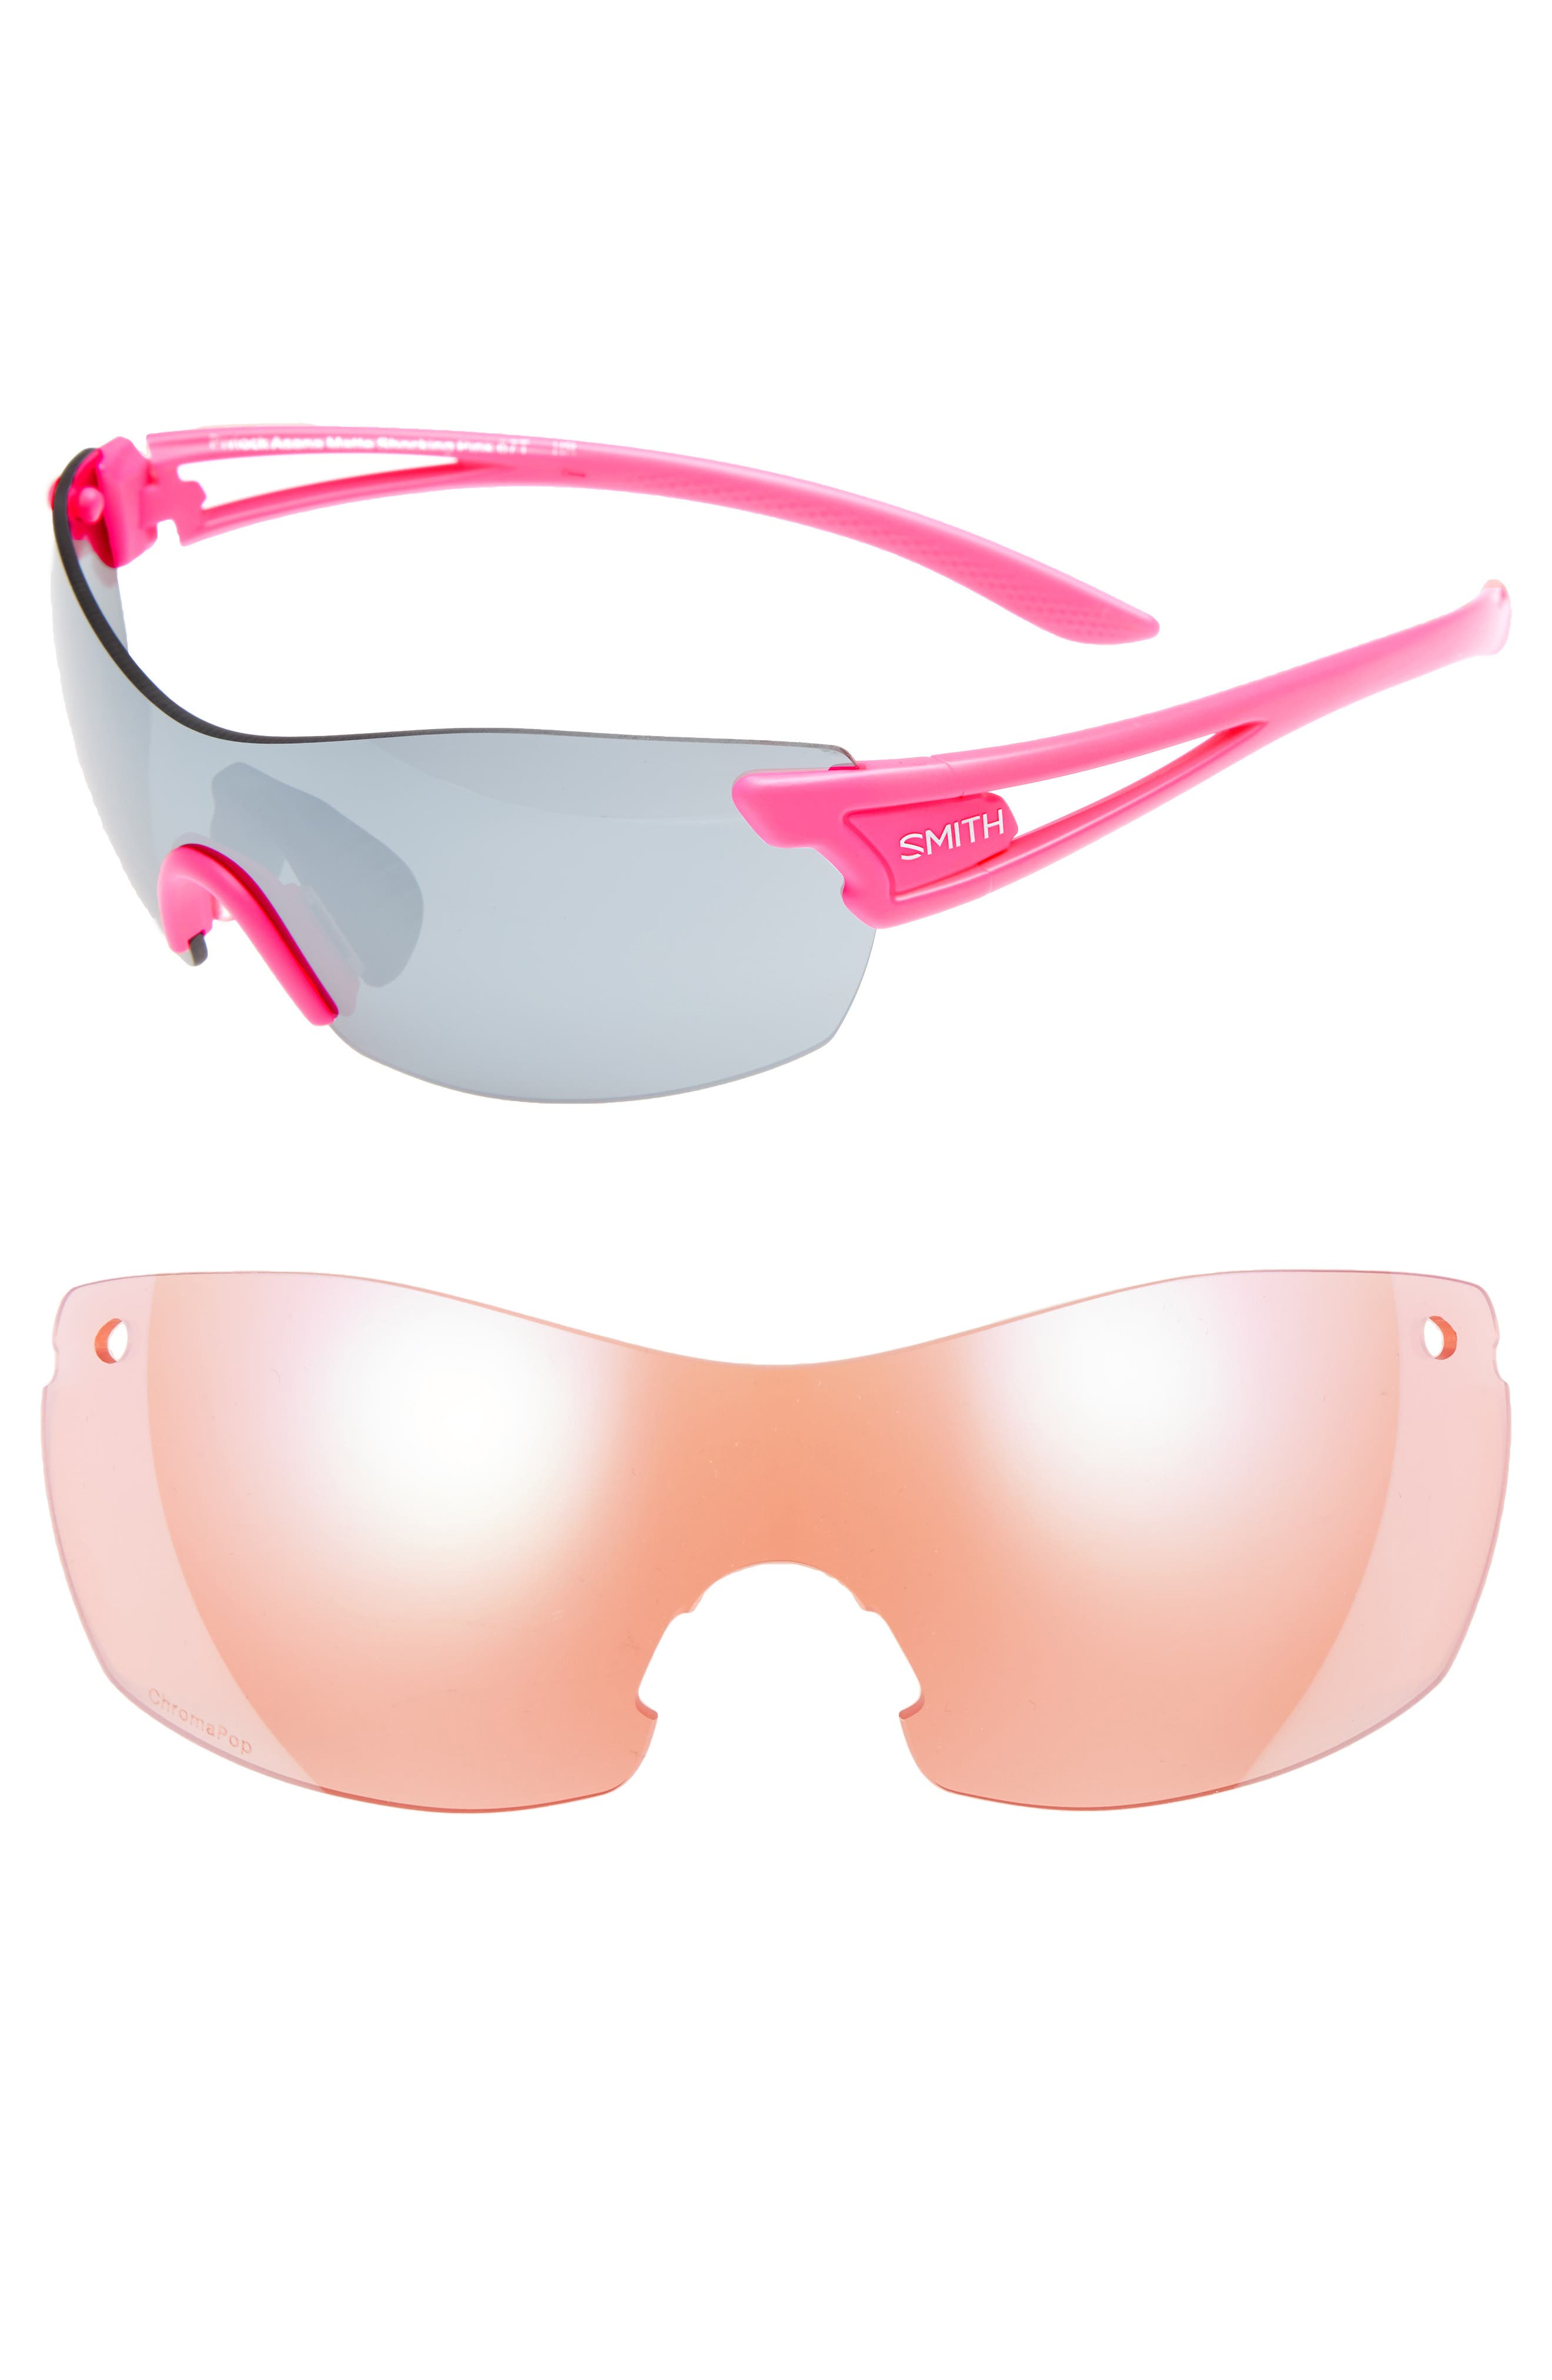 PivLock<sup>™</sup> Asana 150mm ChromaPop Polarized Sunglasses,                             Alternate thumbnail 8, color,